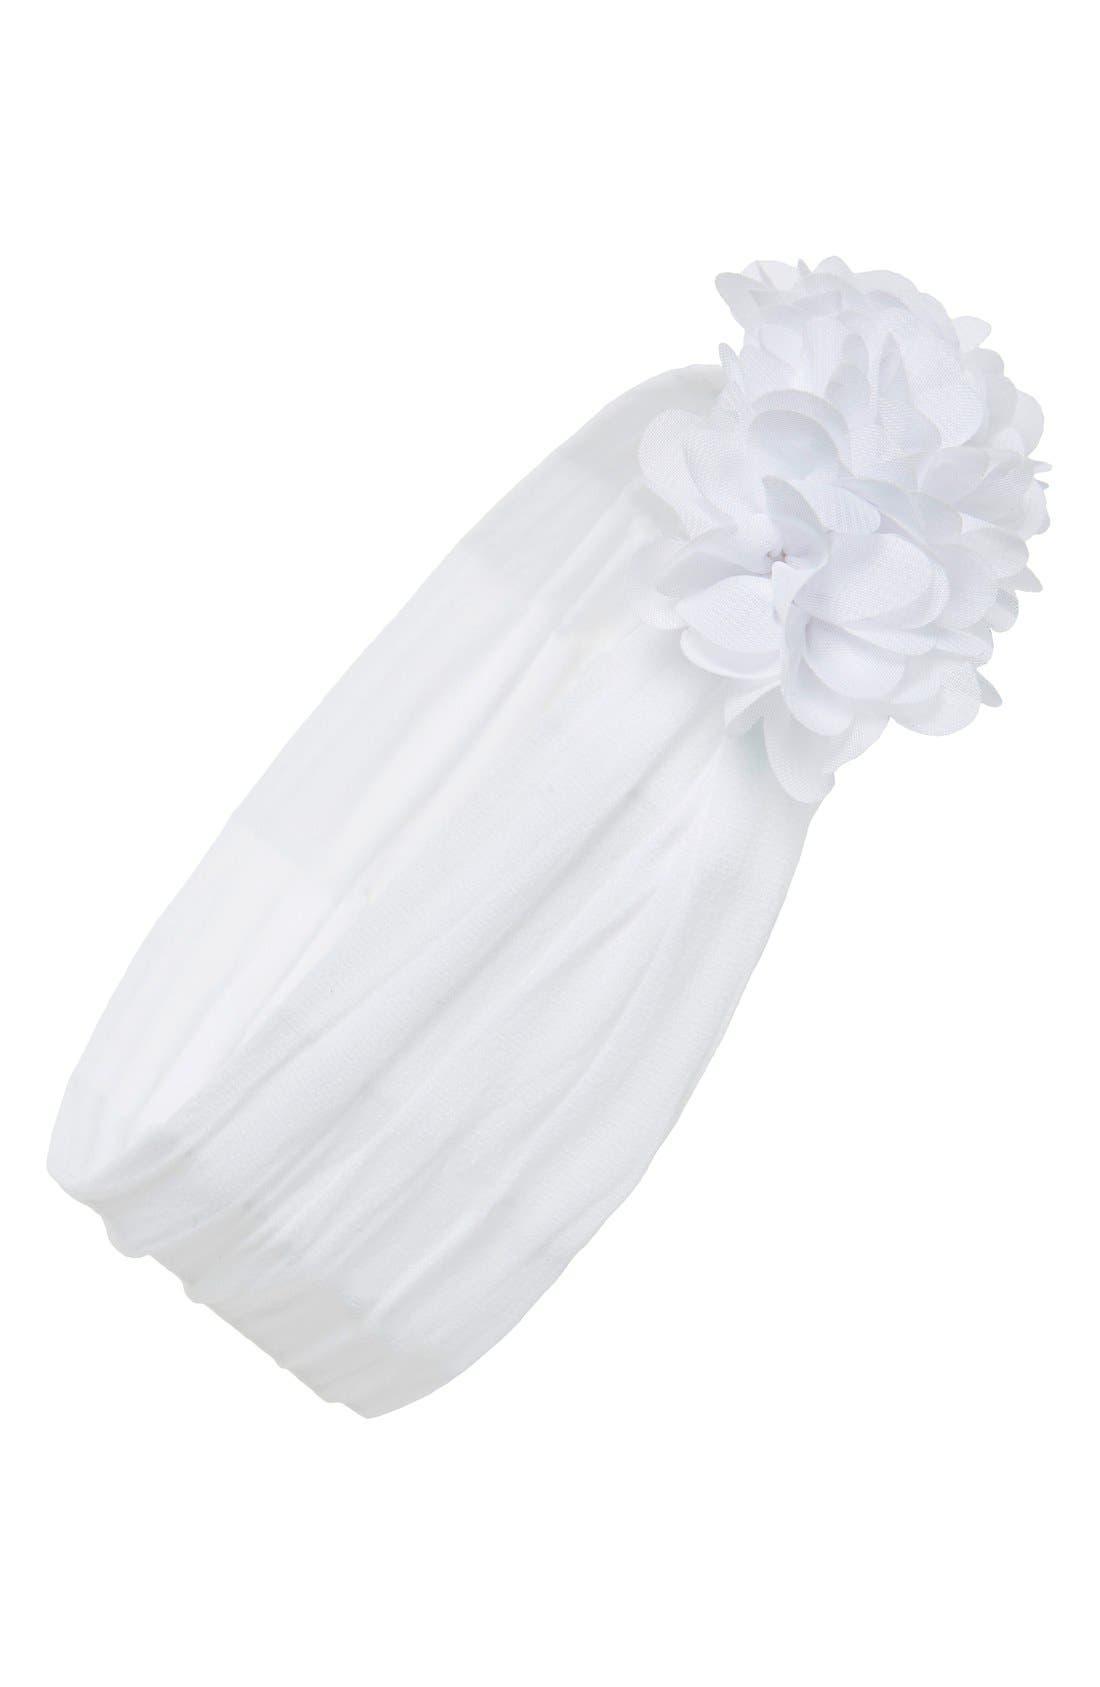 BABY BLING Chiffon Ruffle Headband